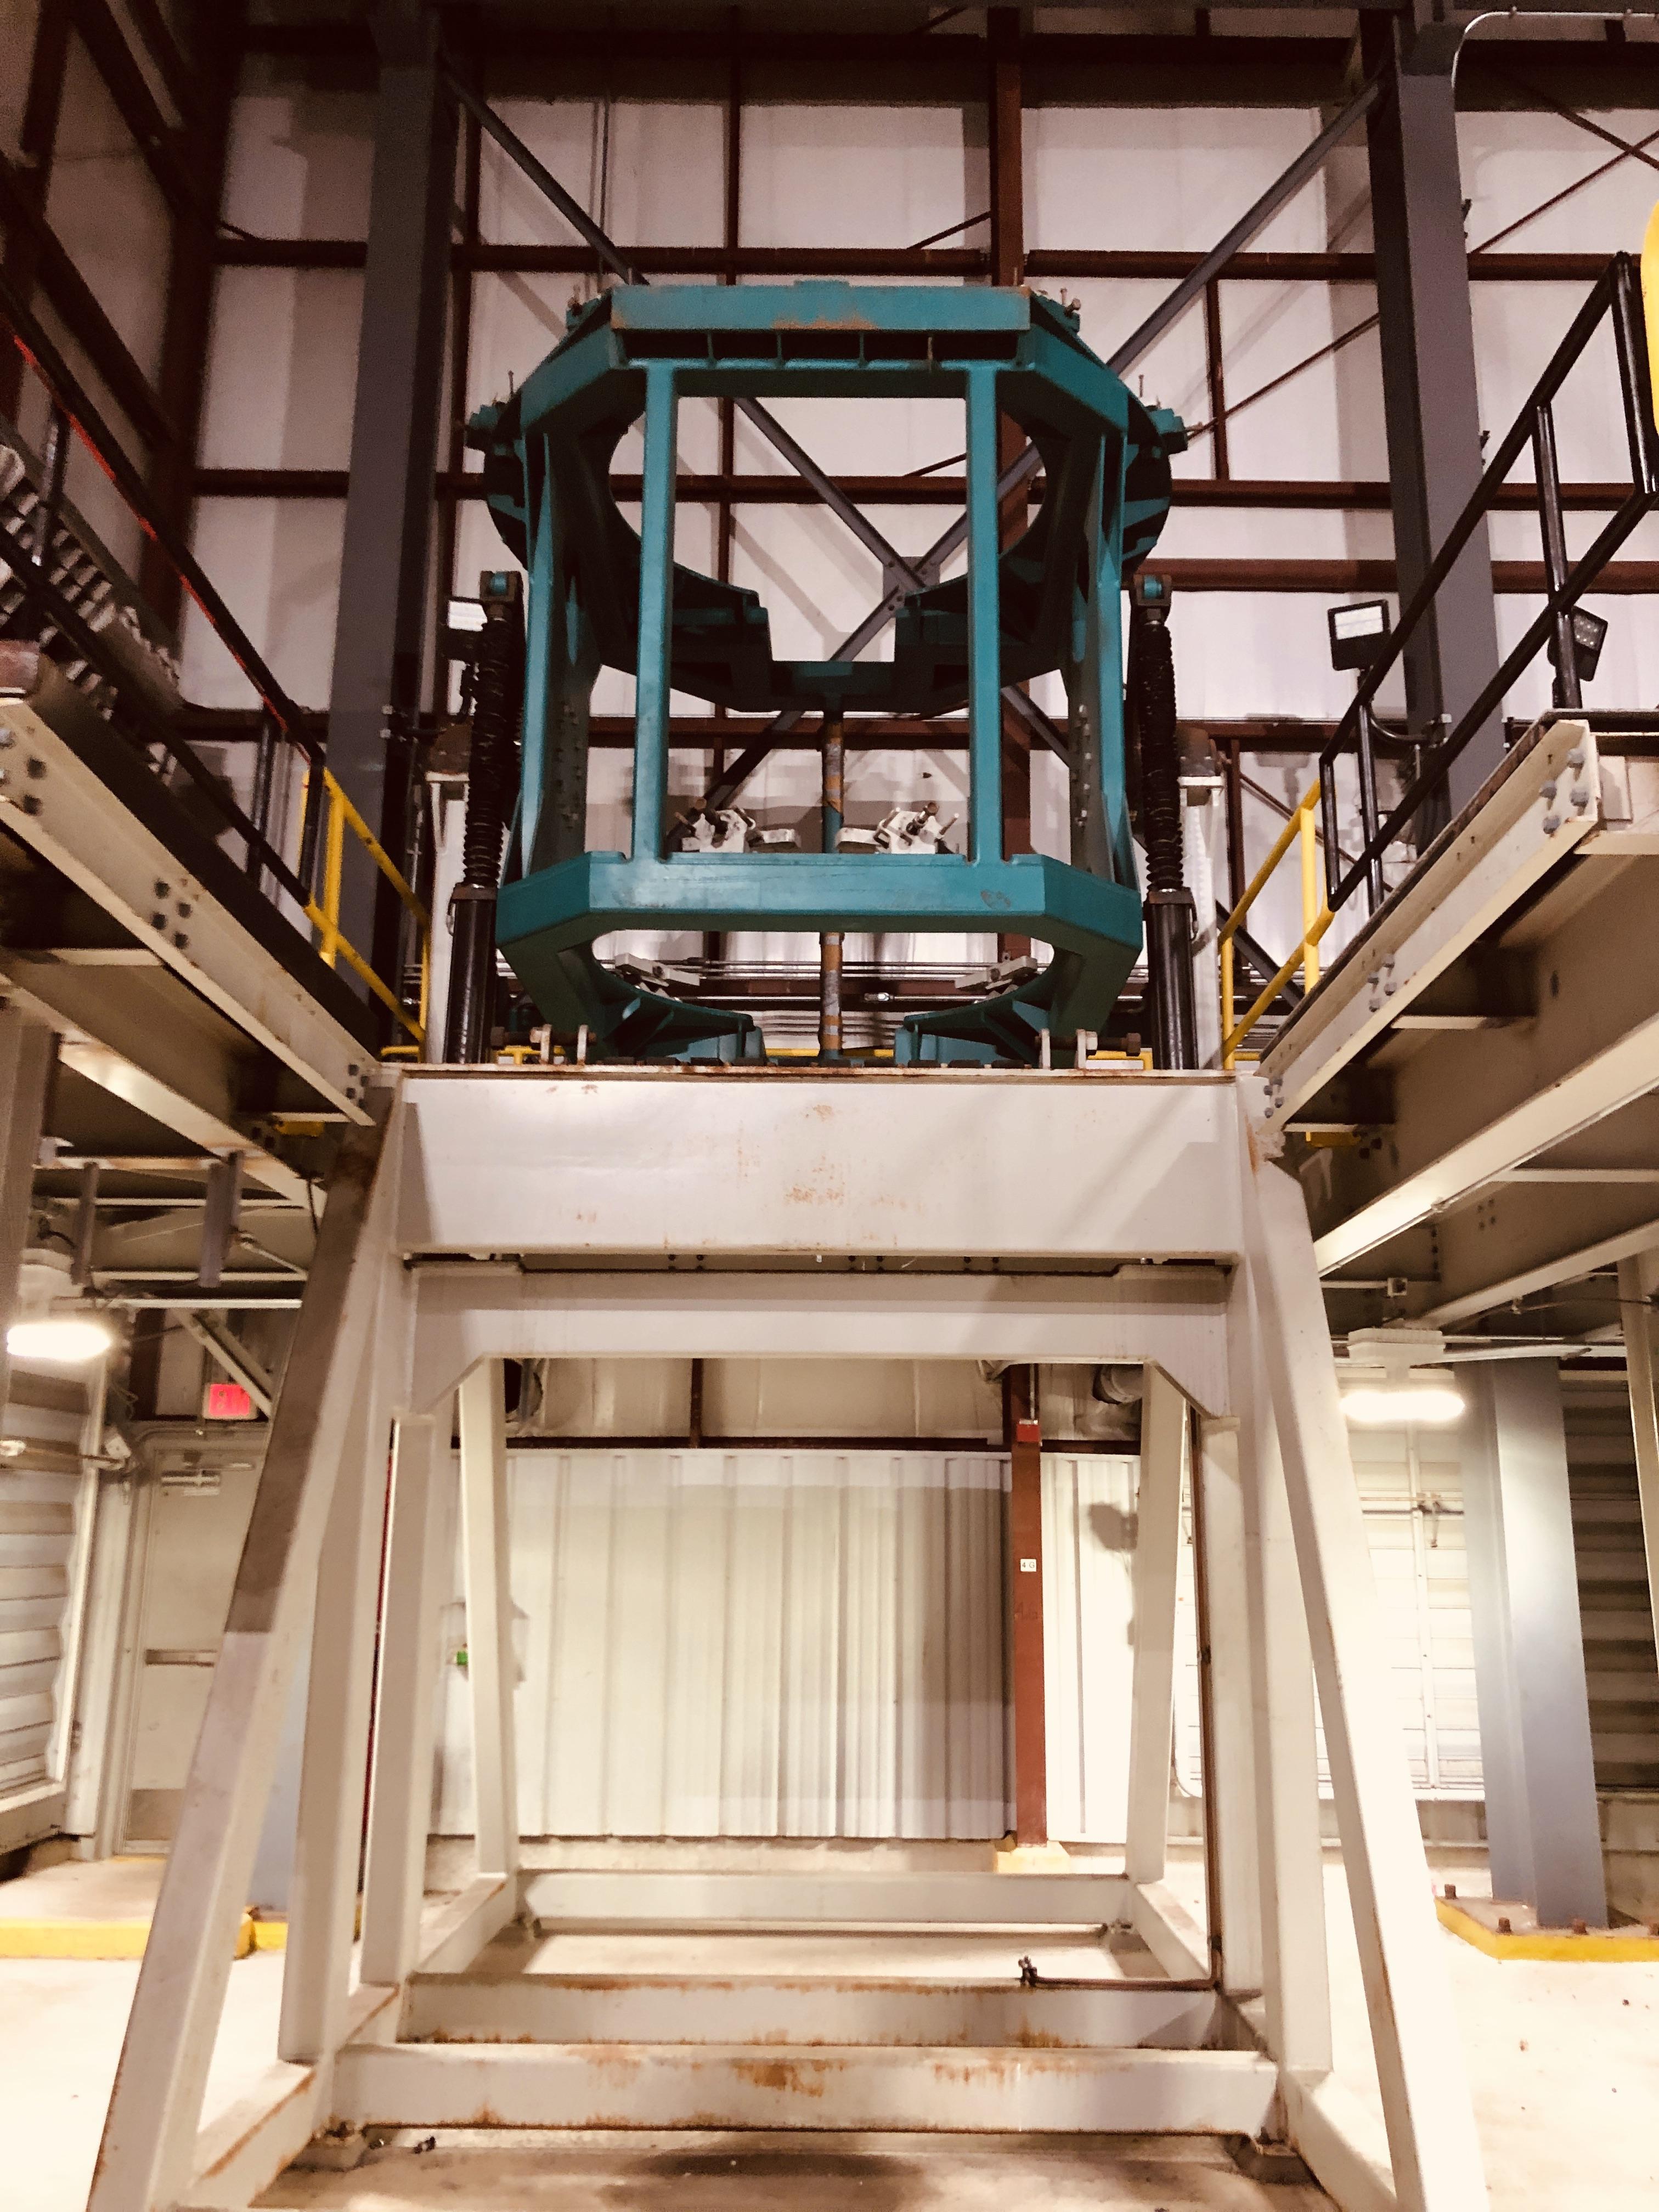 8' Kleenair Retort Furnace, 450 kW